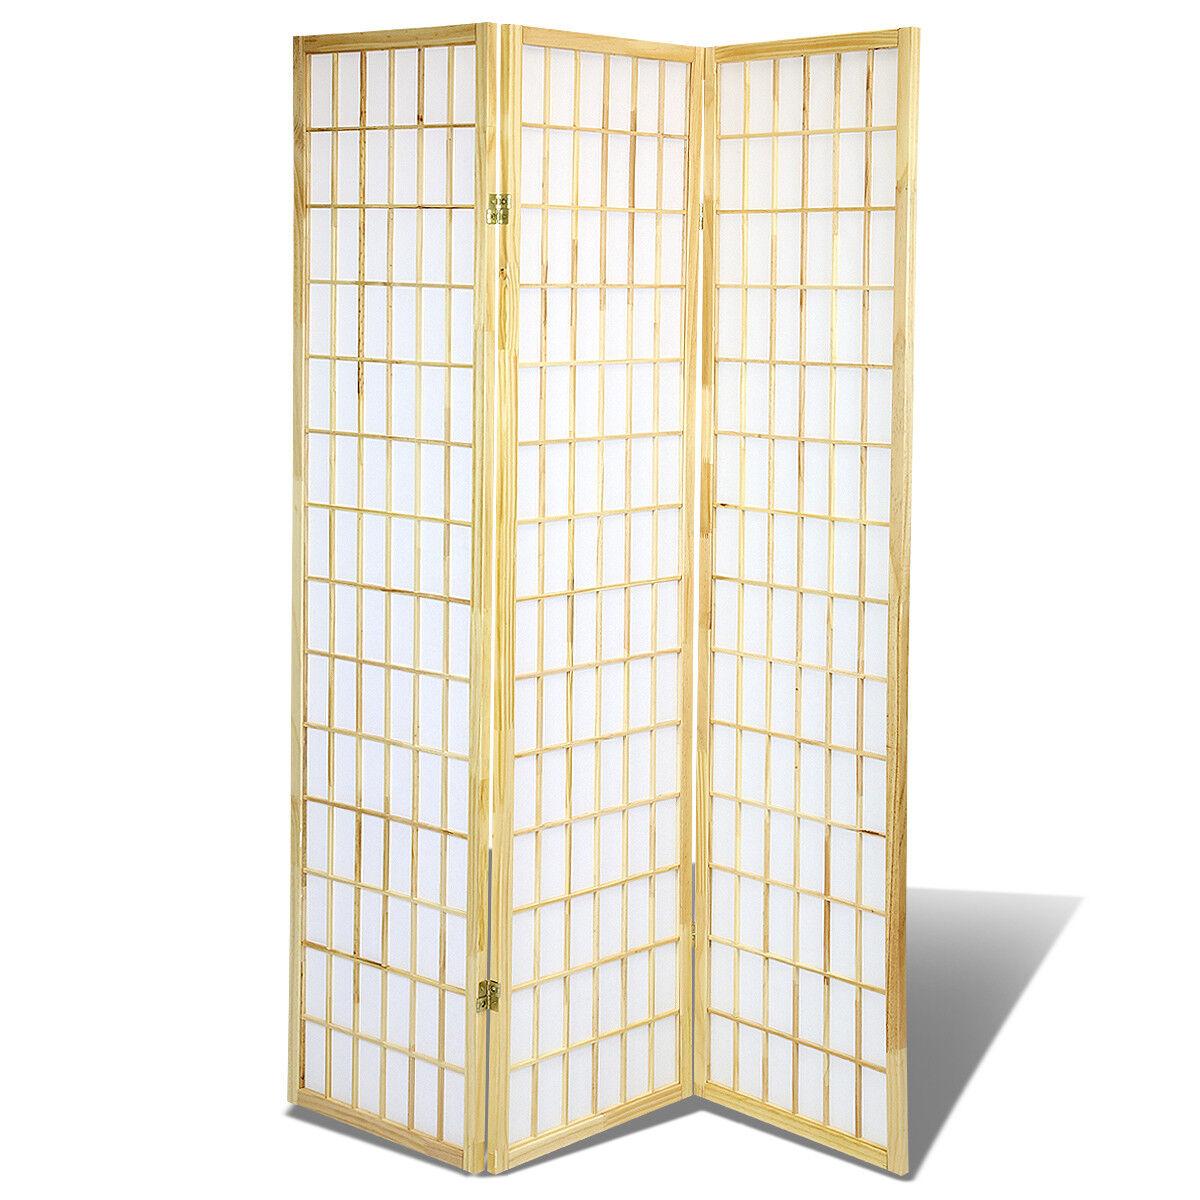 3 /& 4 Panel Japanese Oriental Room Divider Hardwood Shoji Screen Privacy Wall